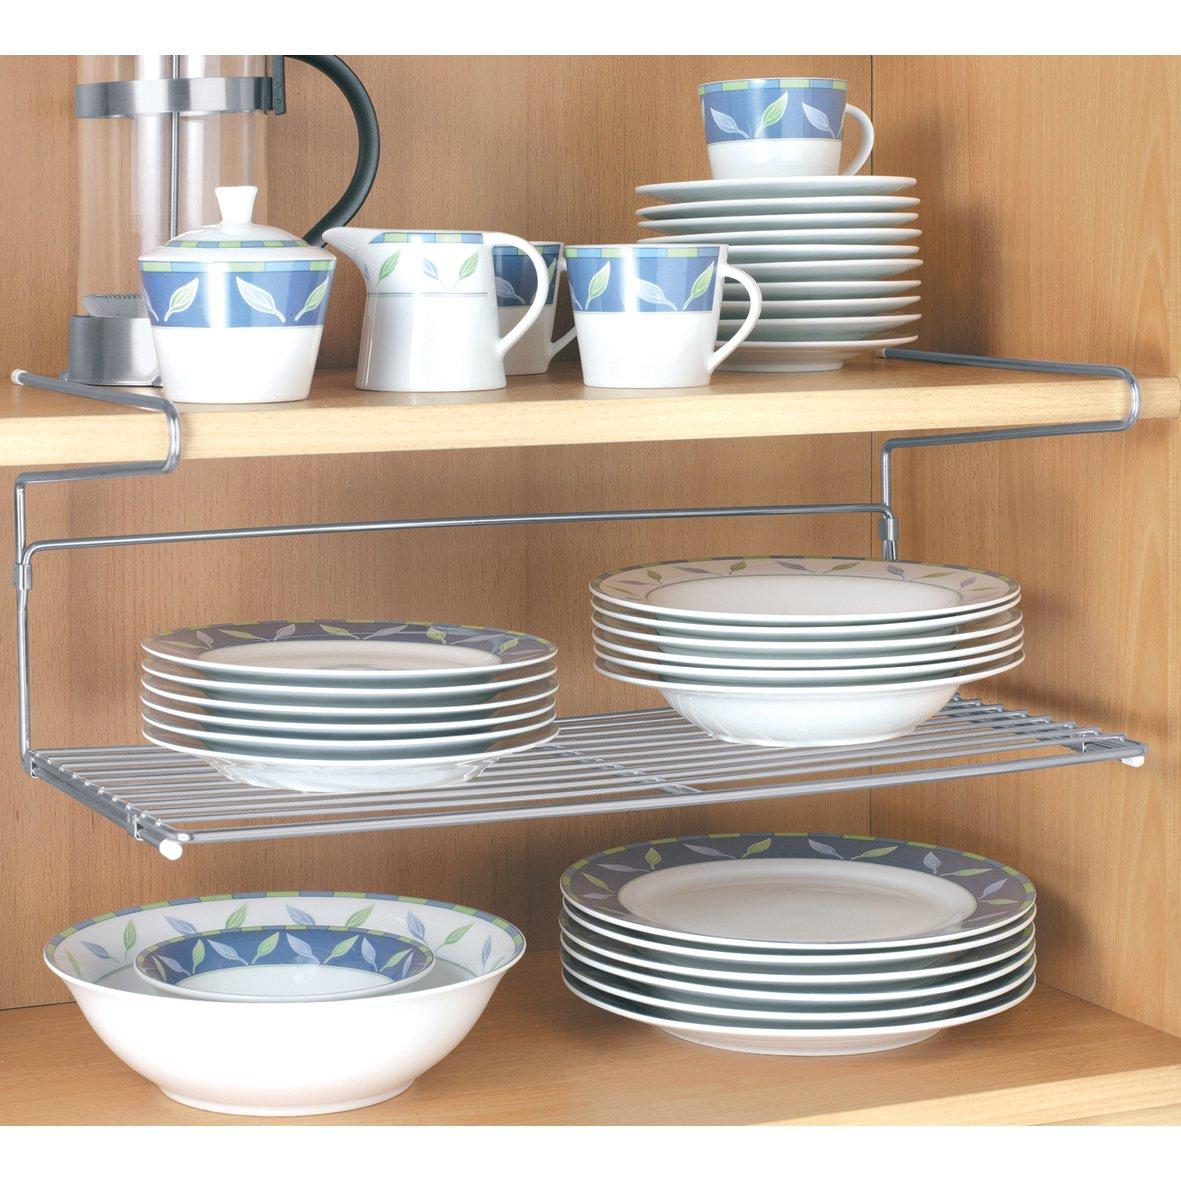 Amazon.de: Tellerregal Hängeregal Tellerhalter Küchenregal Regal